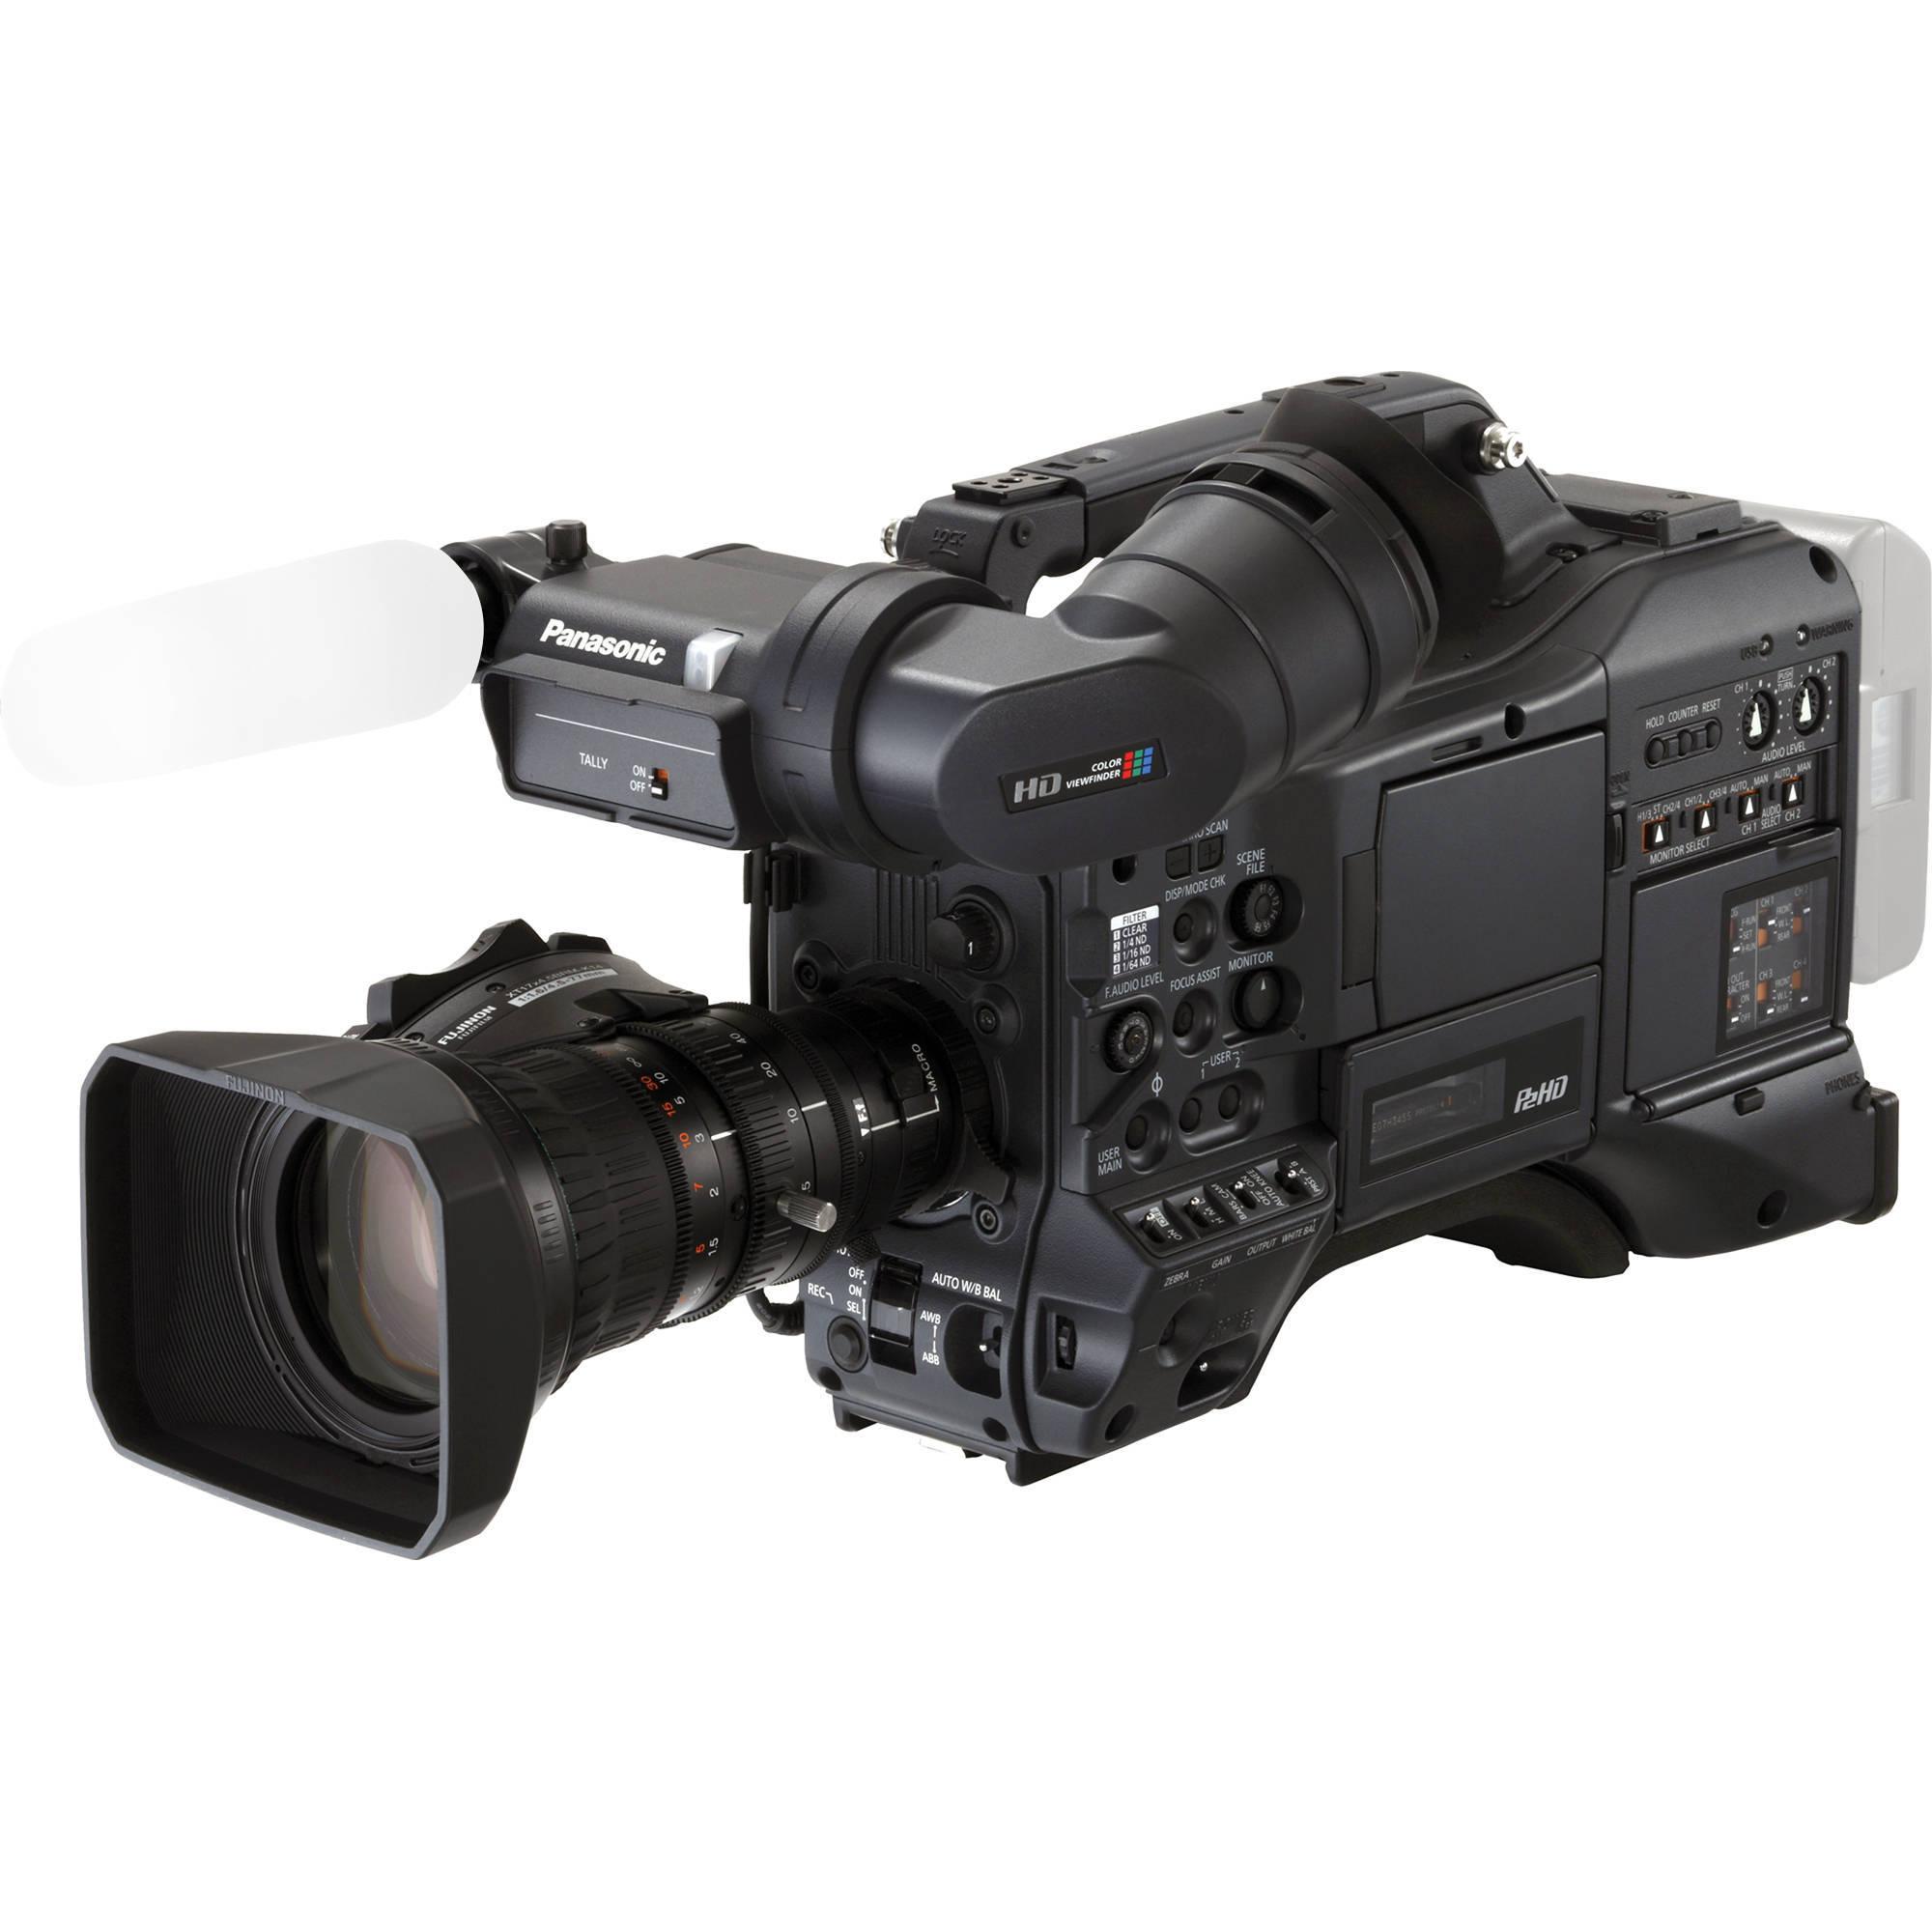 Panasonic AG-HPX370 Series P2 HD Camcorder AGHPX370PJ B&H Photo